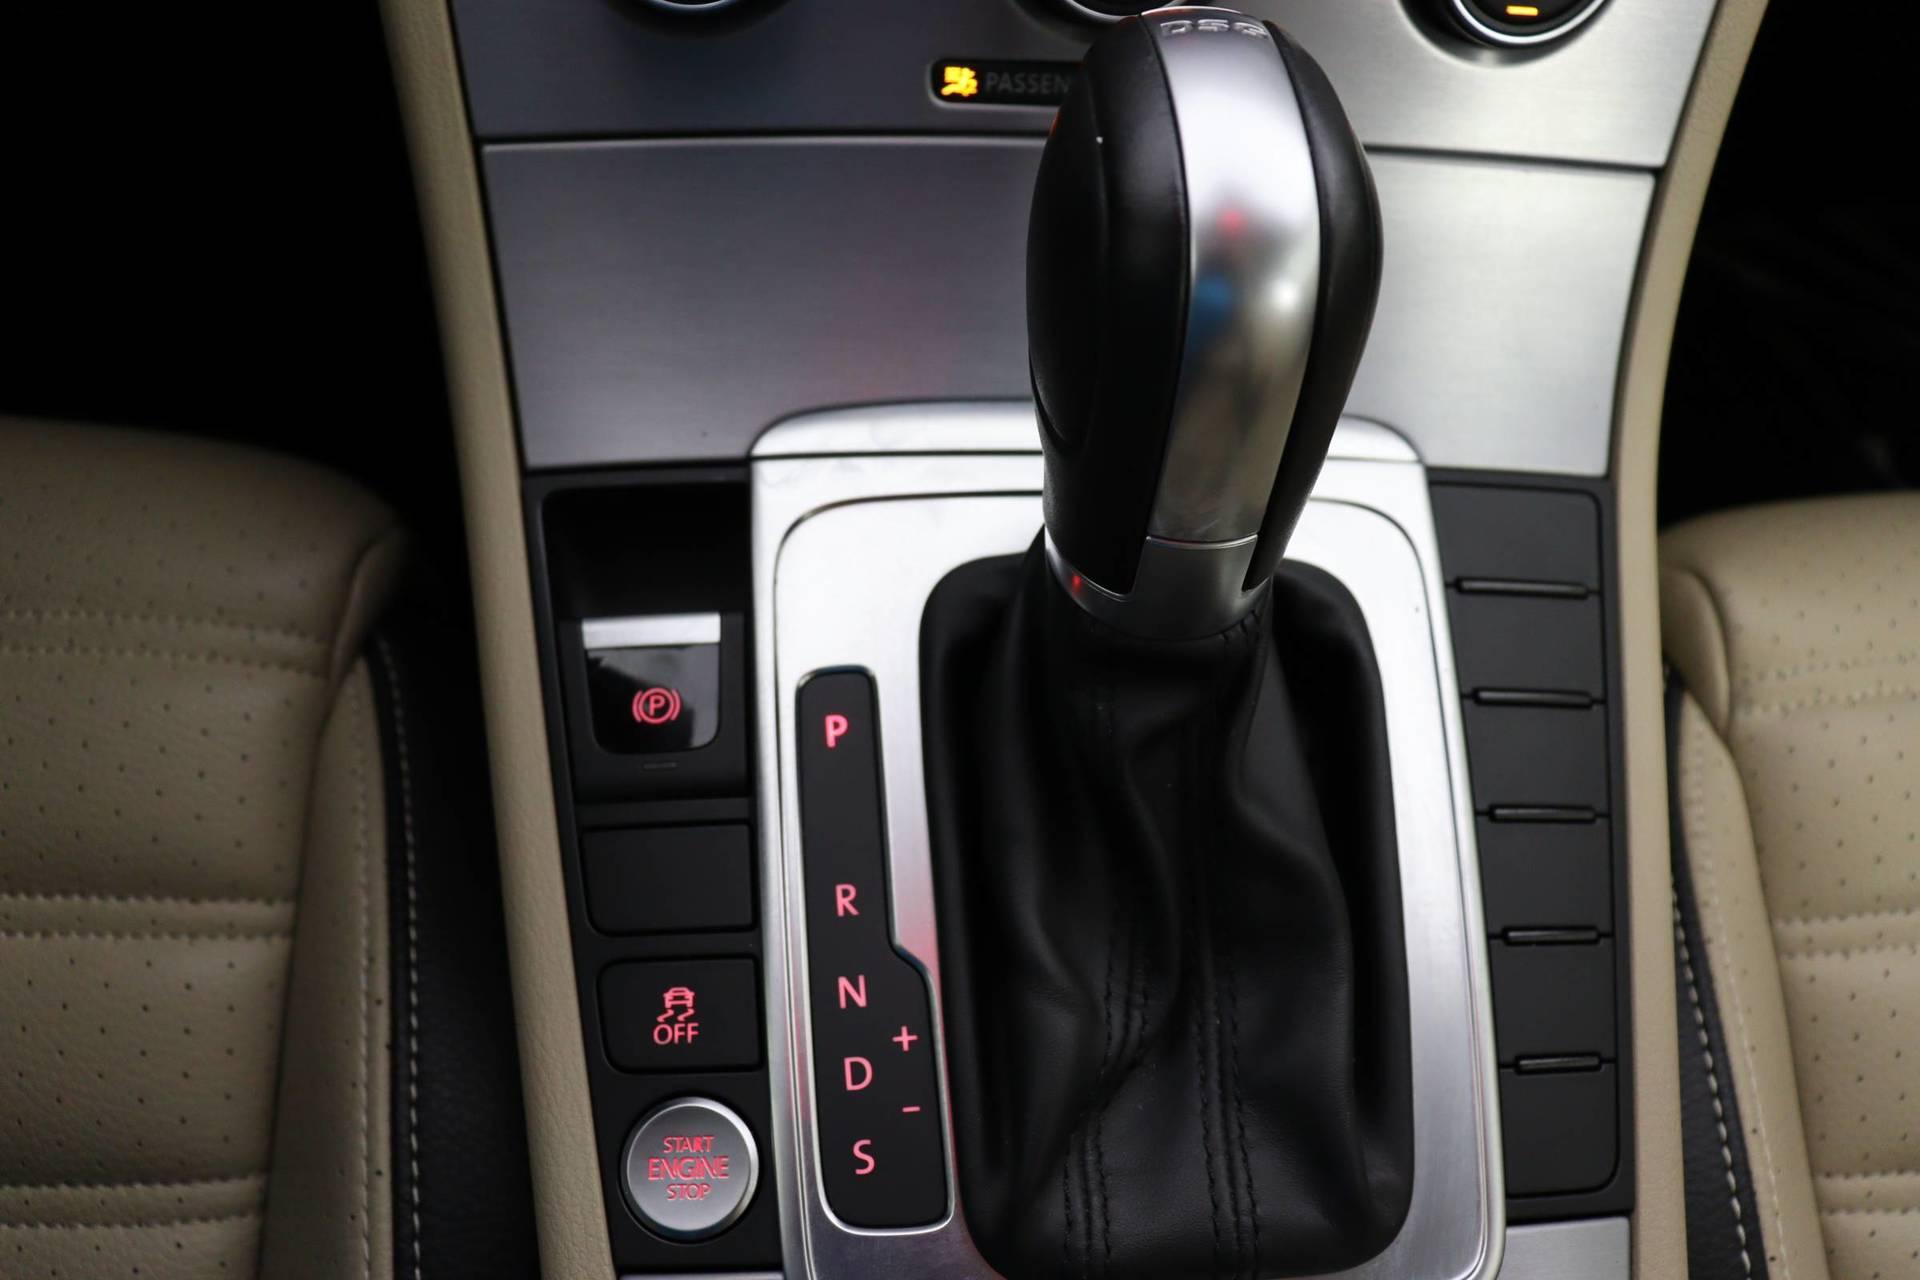 used vehicle - Sedan VOLKSWAGEN CC 2017